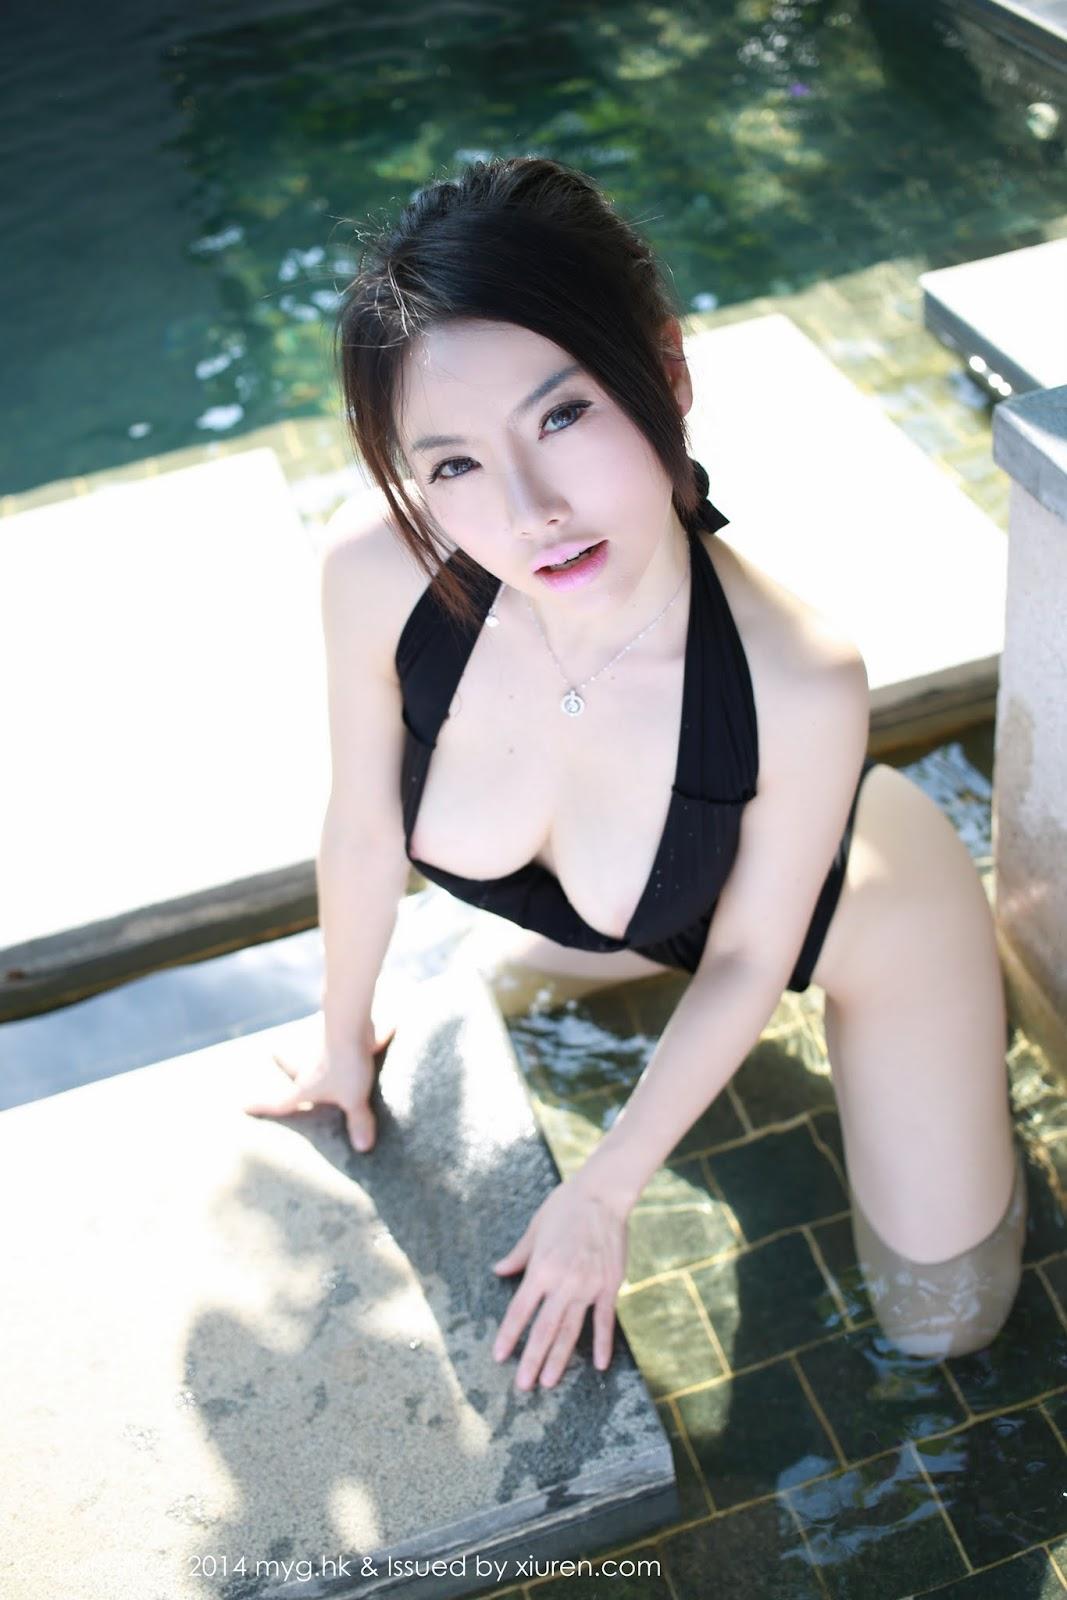 40040 103 - MYGIRL VOL.30 Photo Nude Hot Sexy